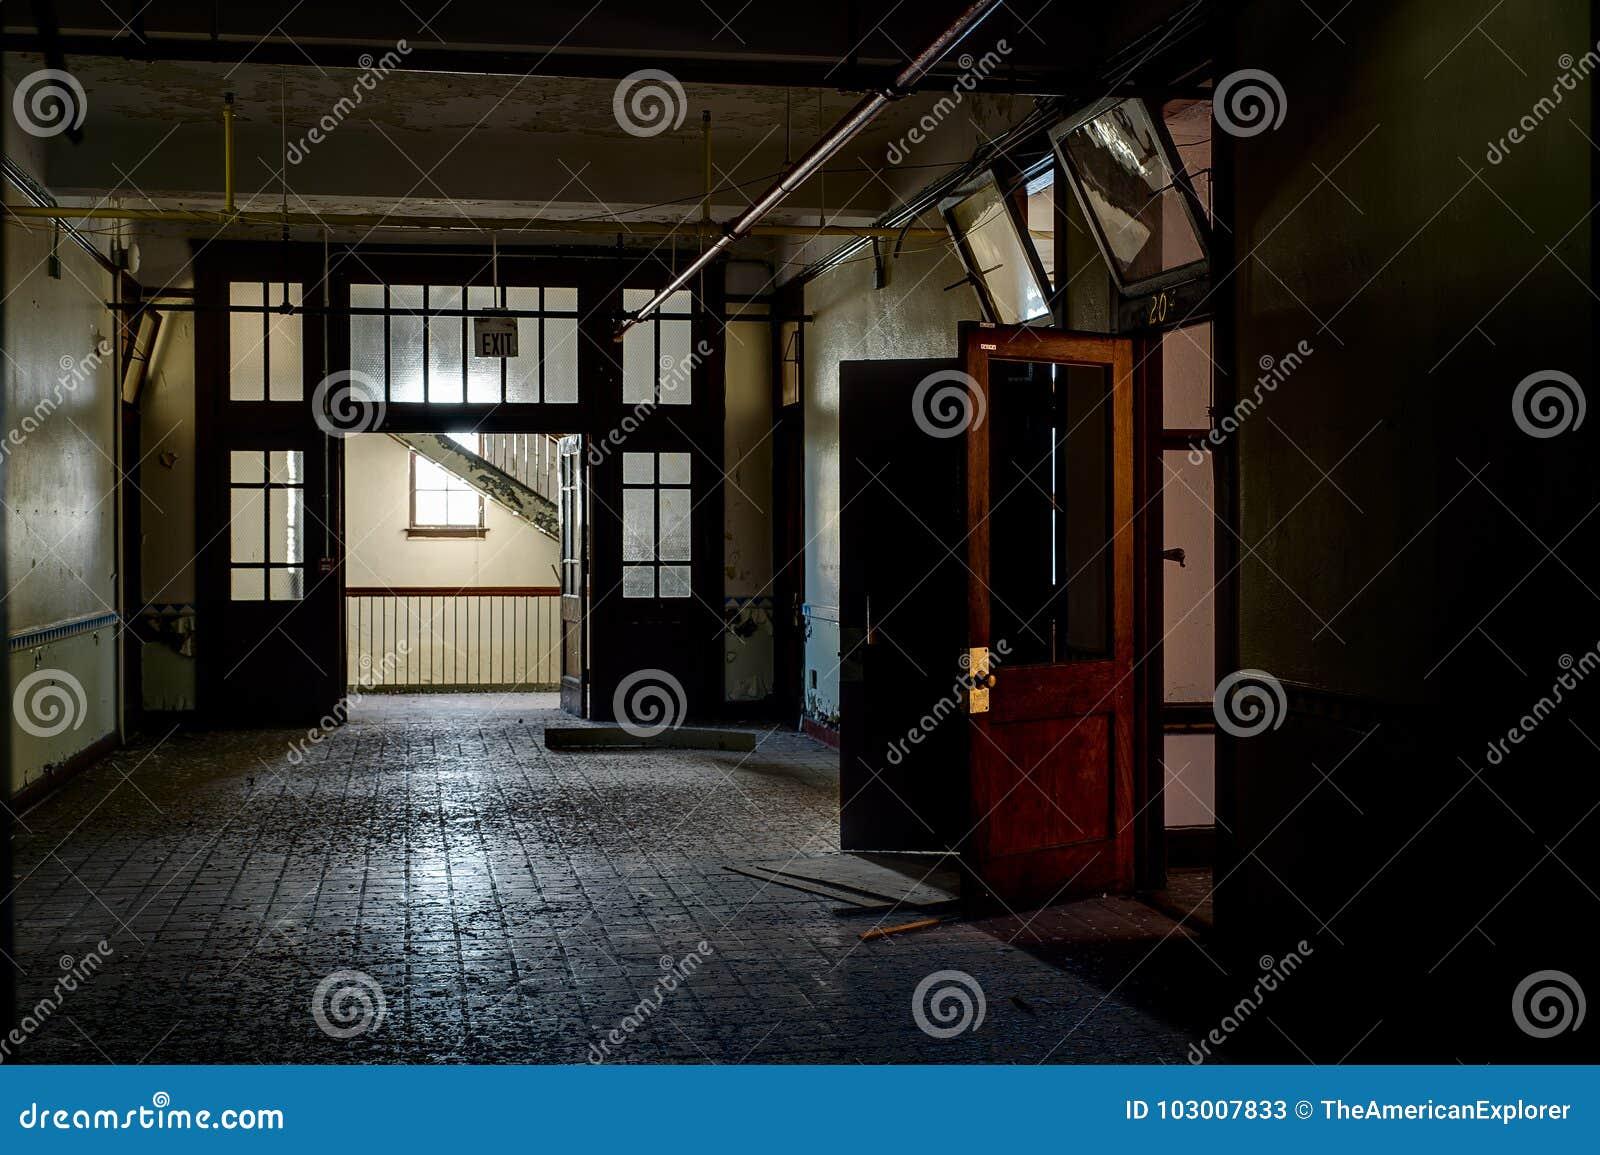 Derelict Hallway - Abandoned Saint Philomena School, East Cleveland, Ohio